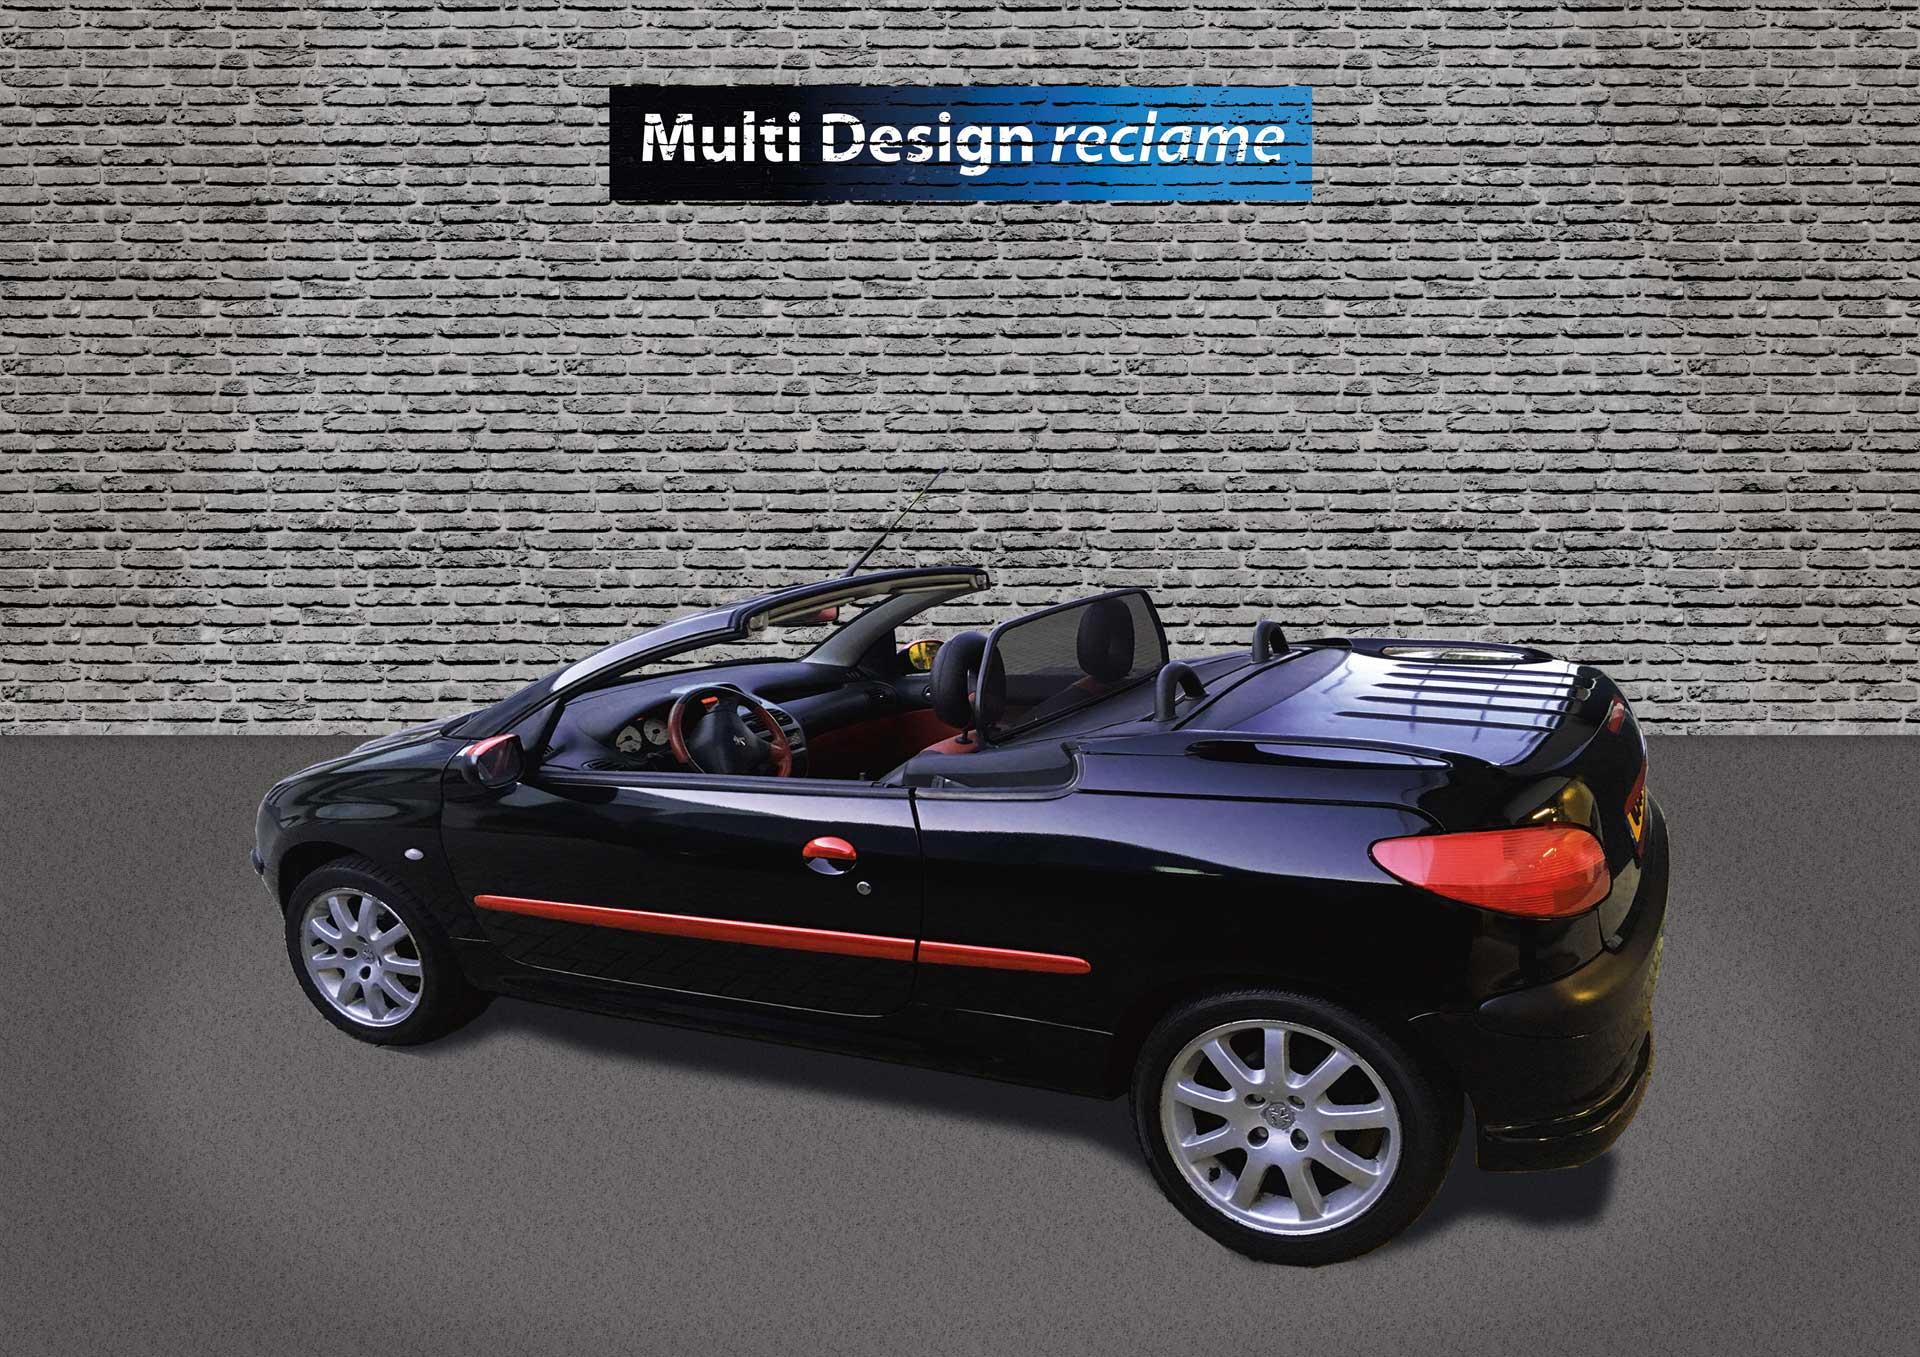 Multi Design Reclame - Autowrap Creafun